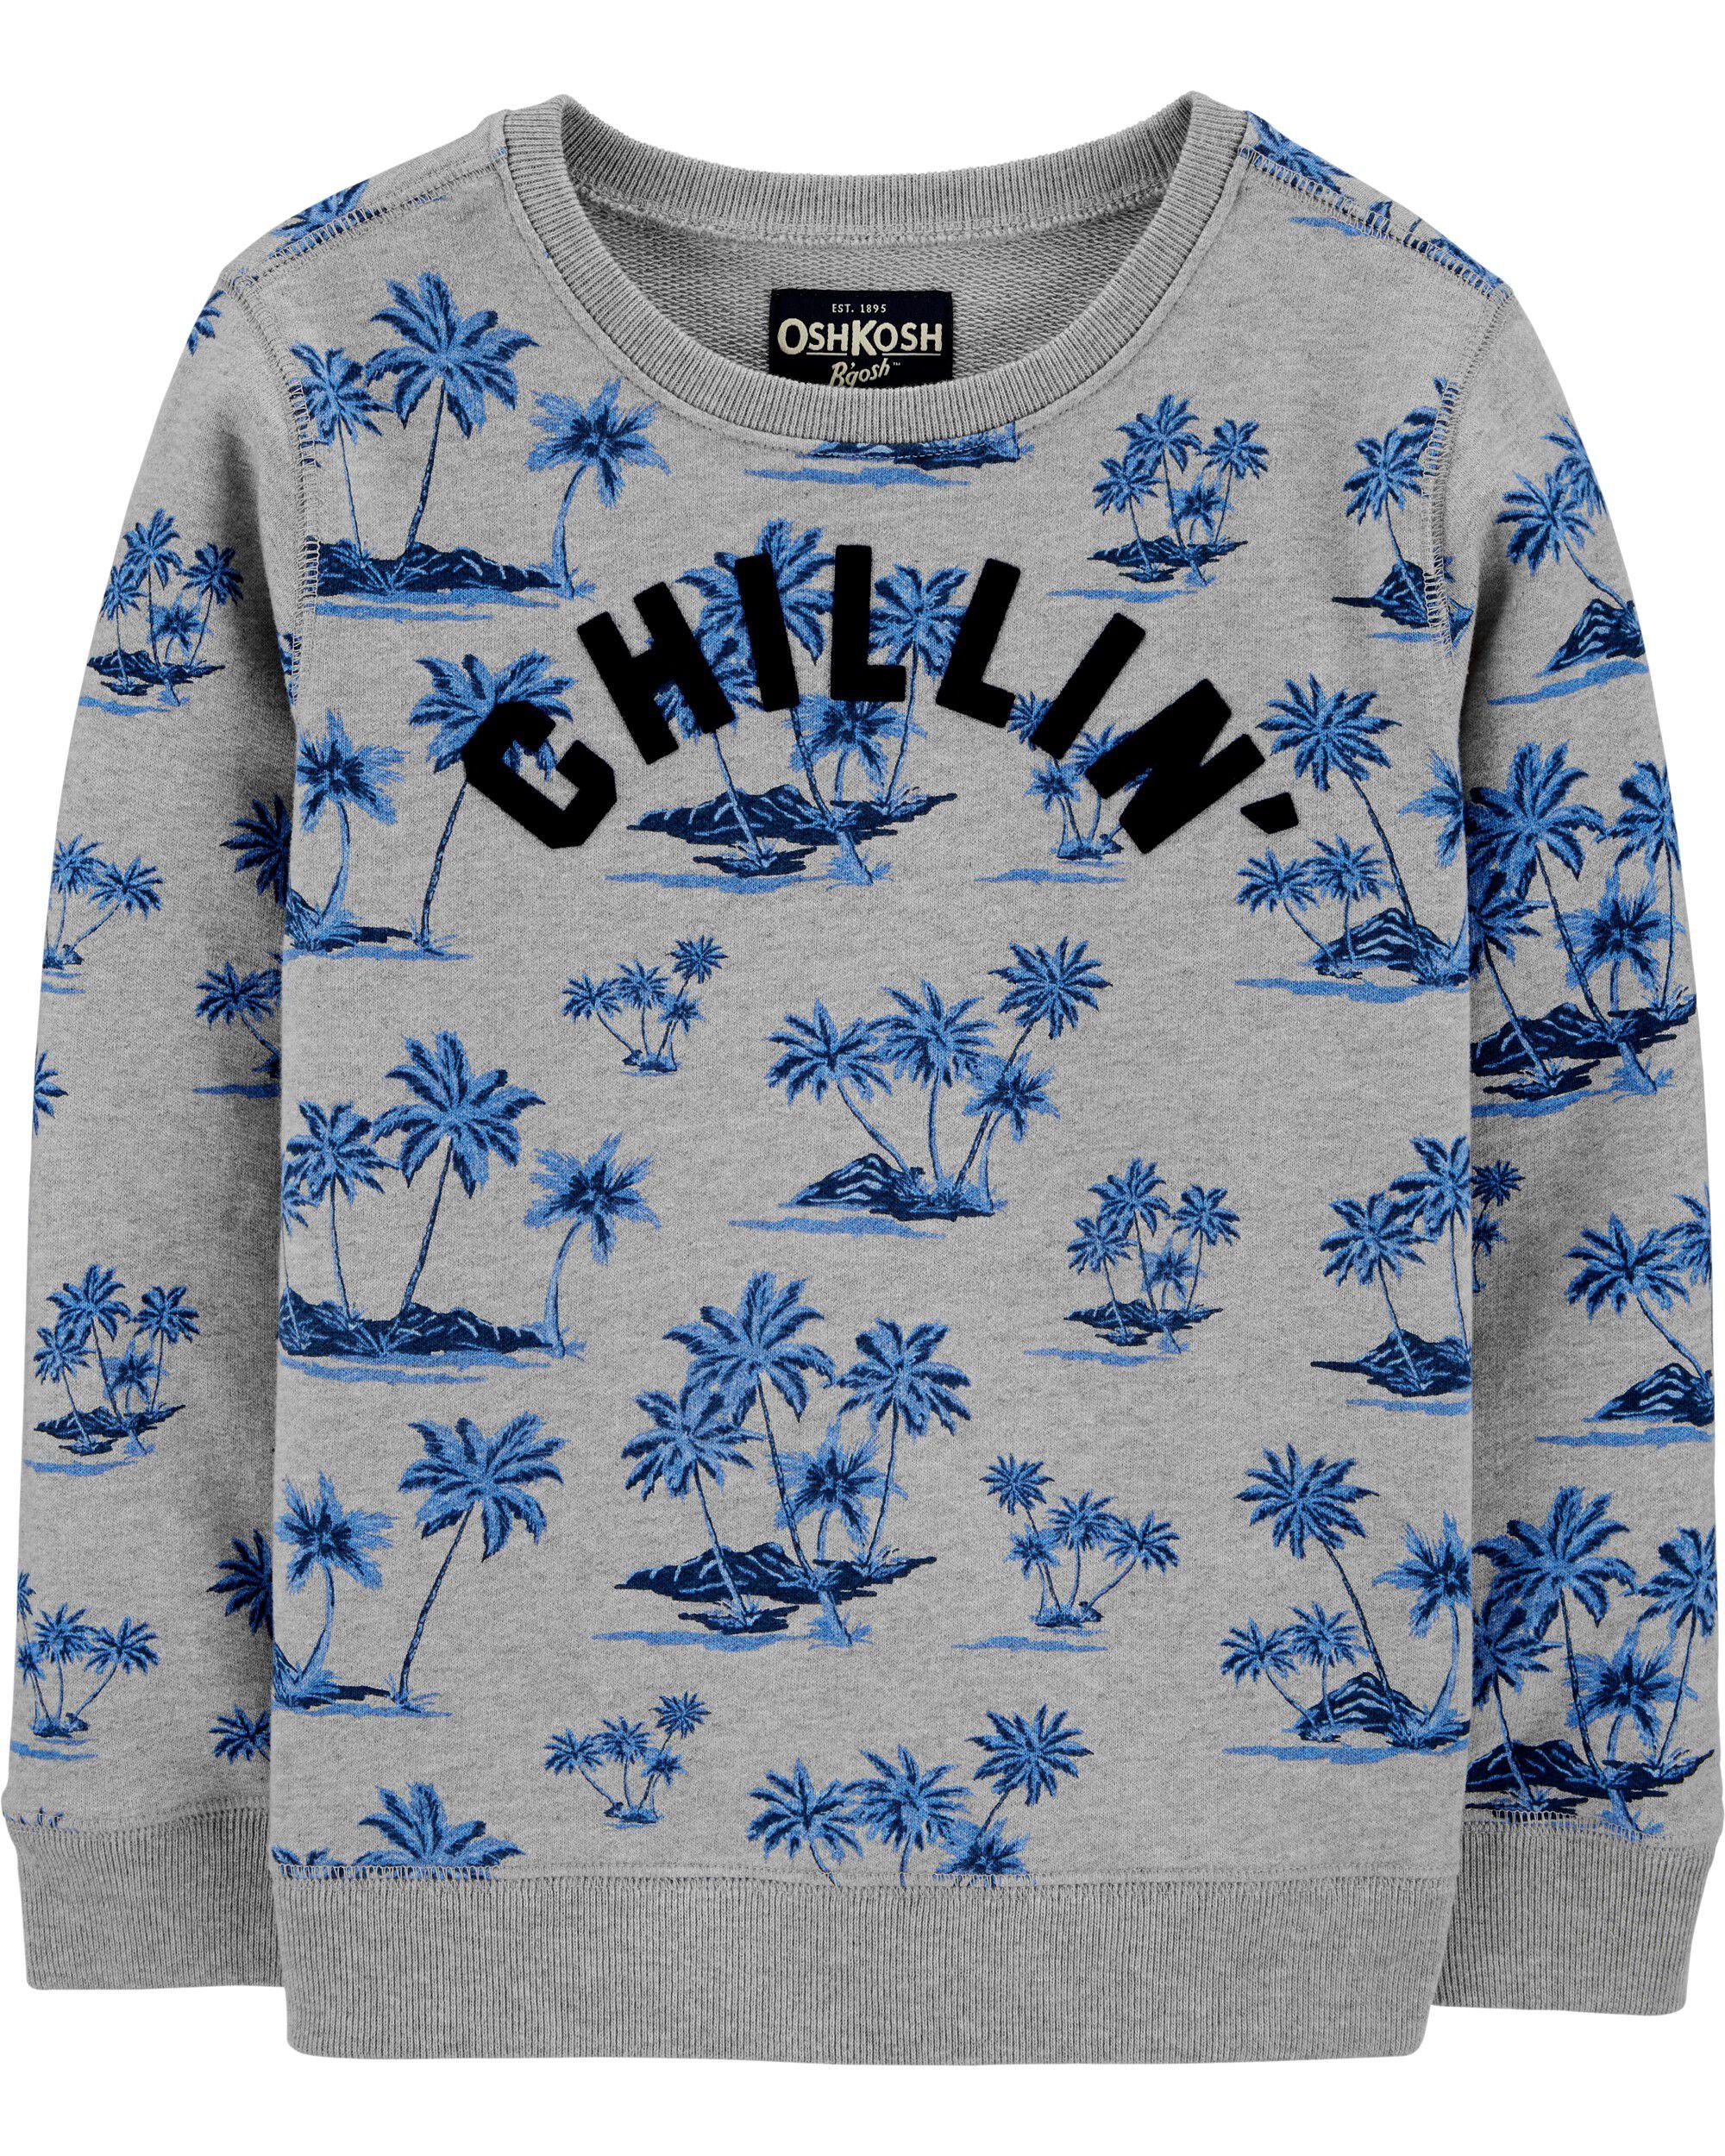 *CLEARANCE*Crew Neck Chillin' Sweatshirt